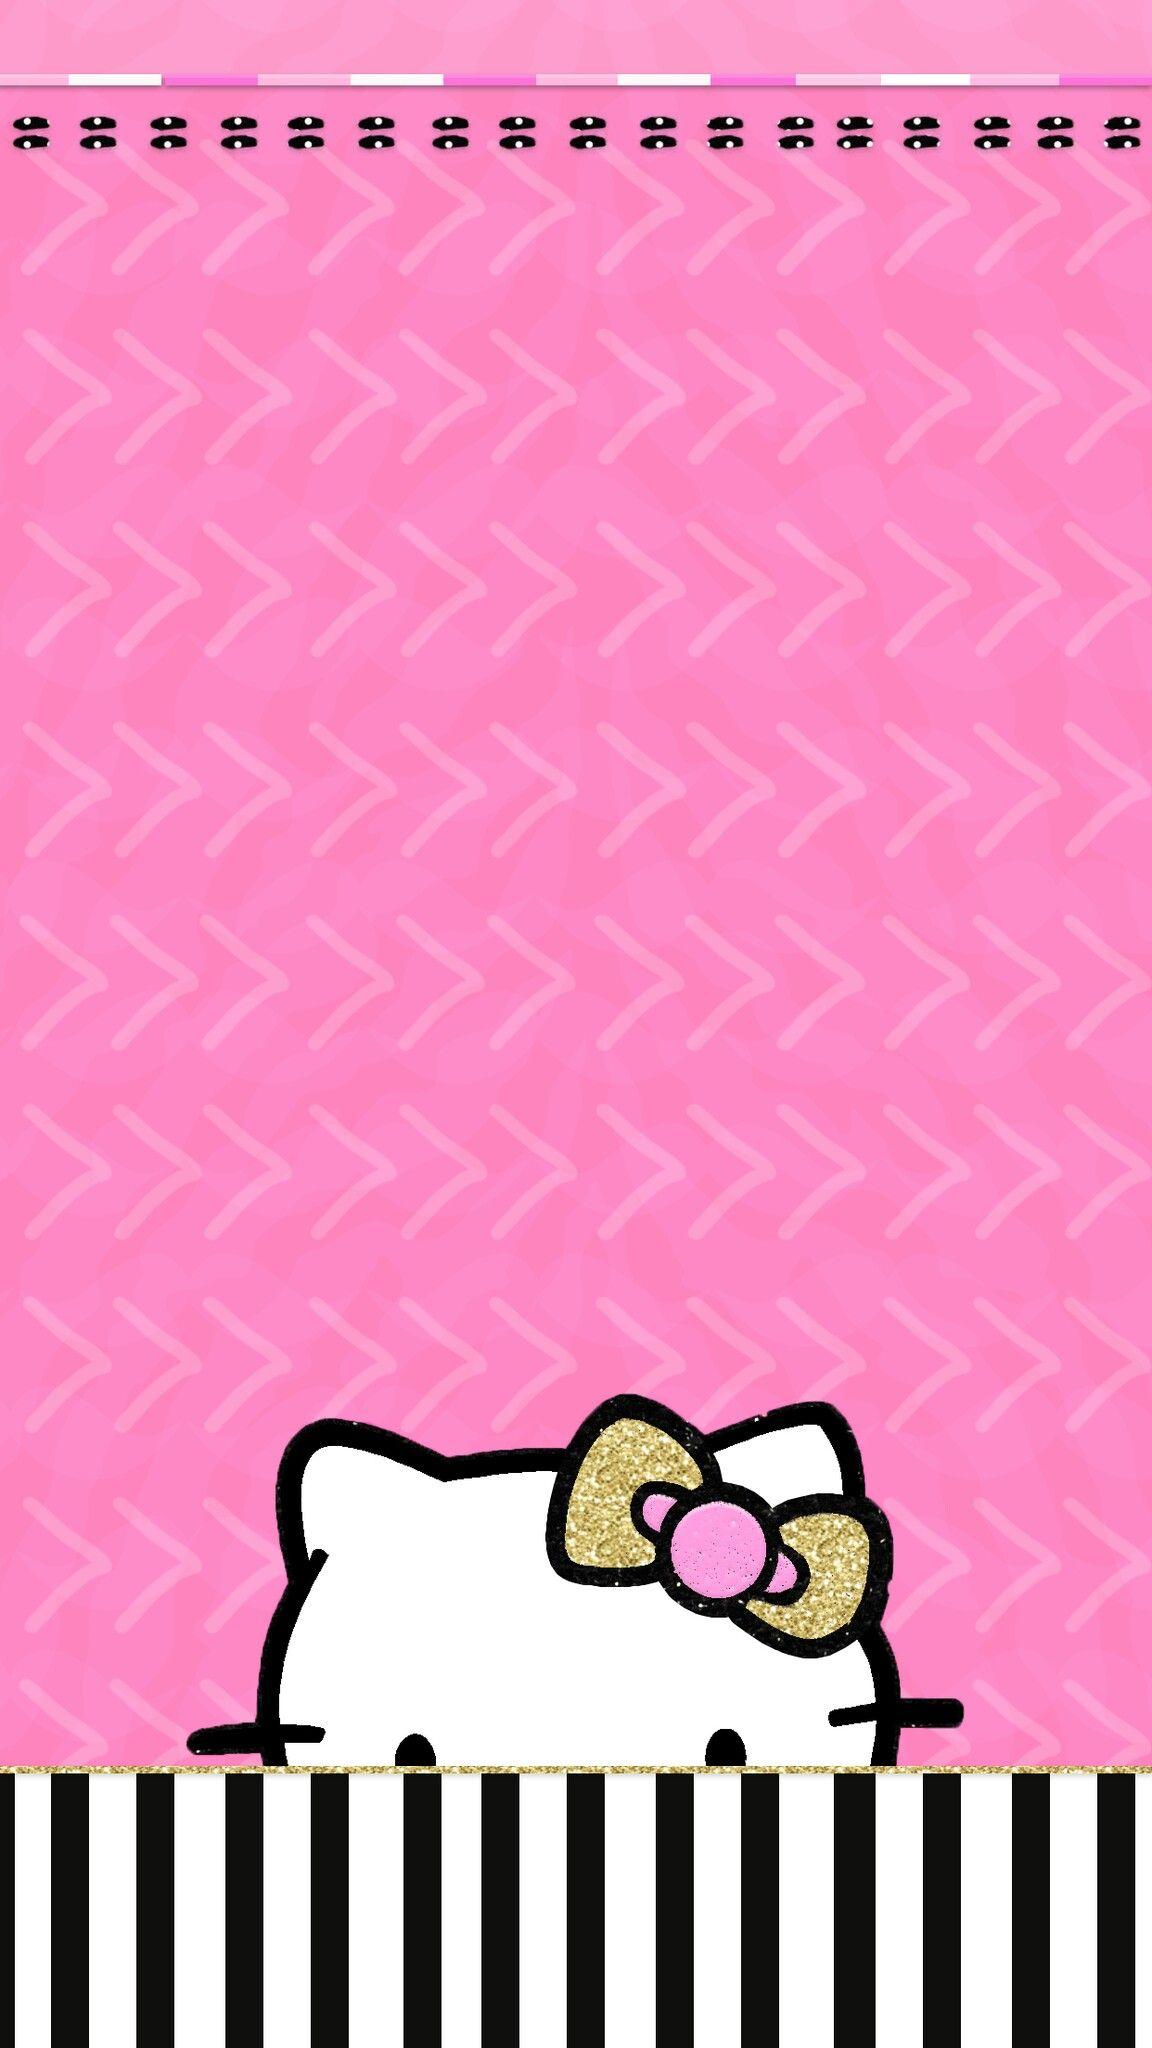 Pin By Matthew Lloyd On Wallpapers Pinterest Hello Kitty